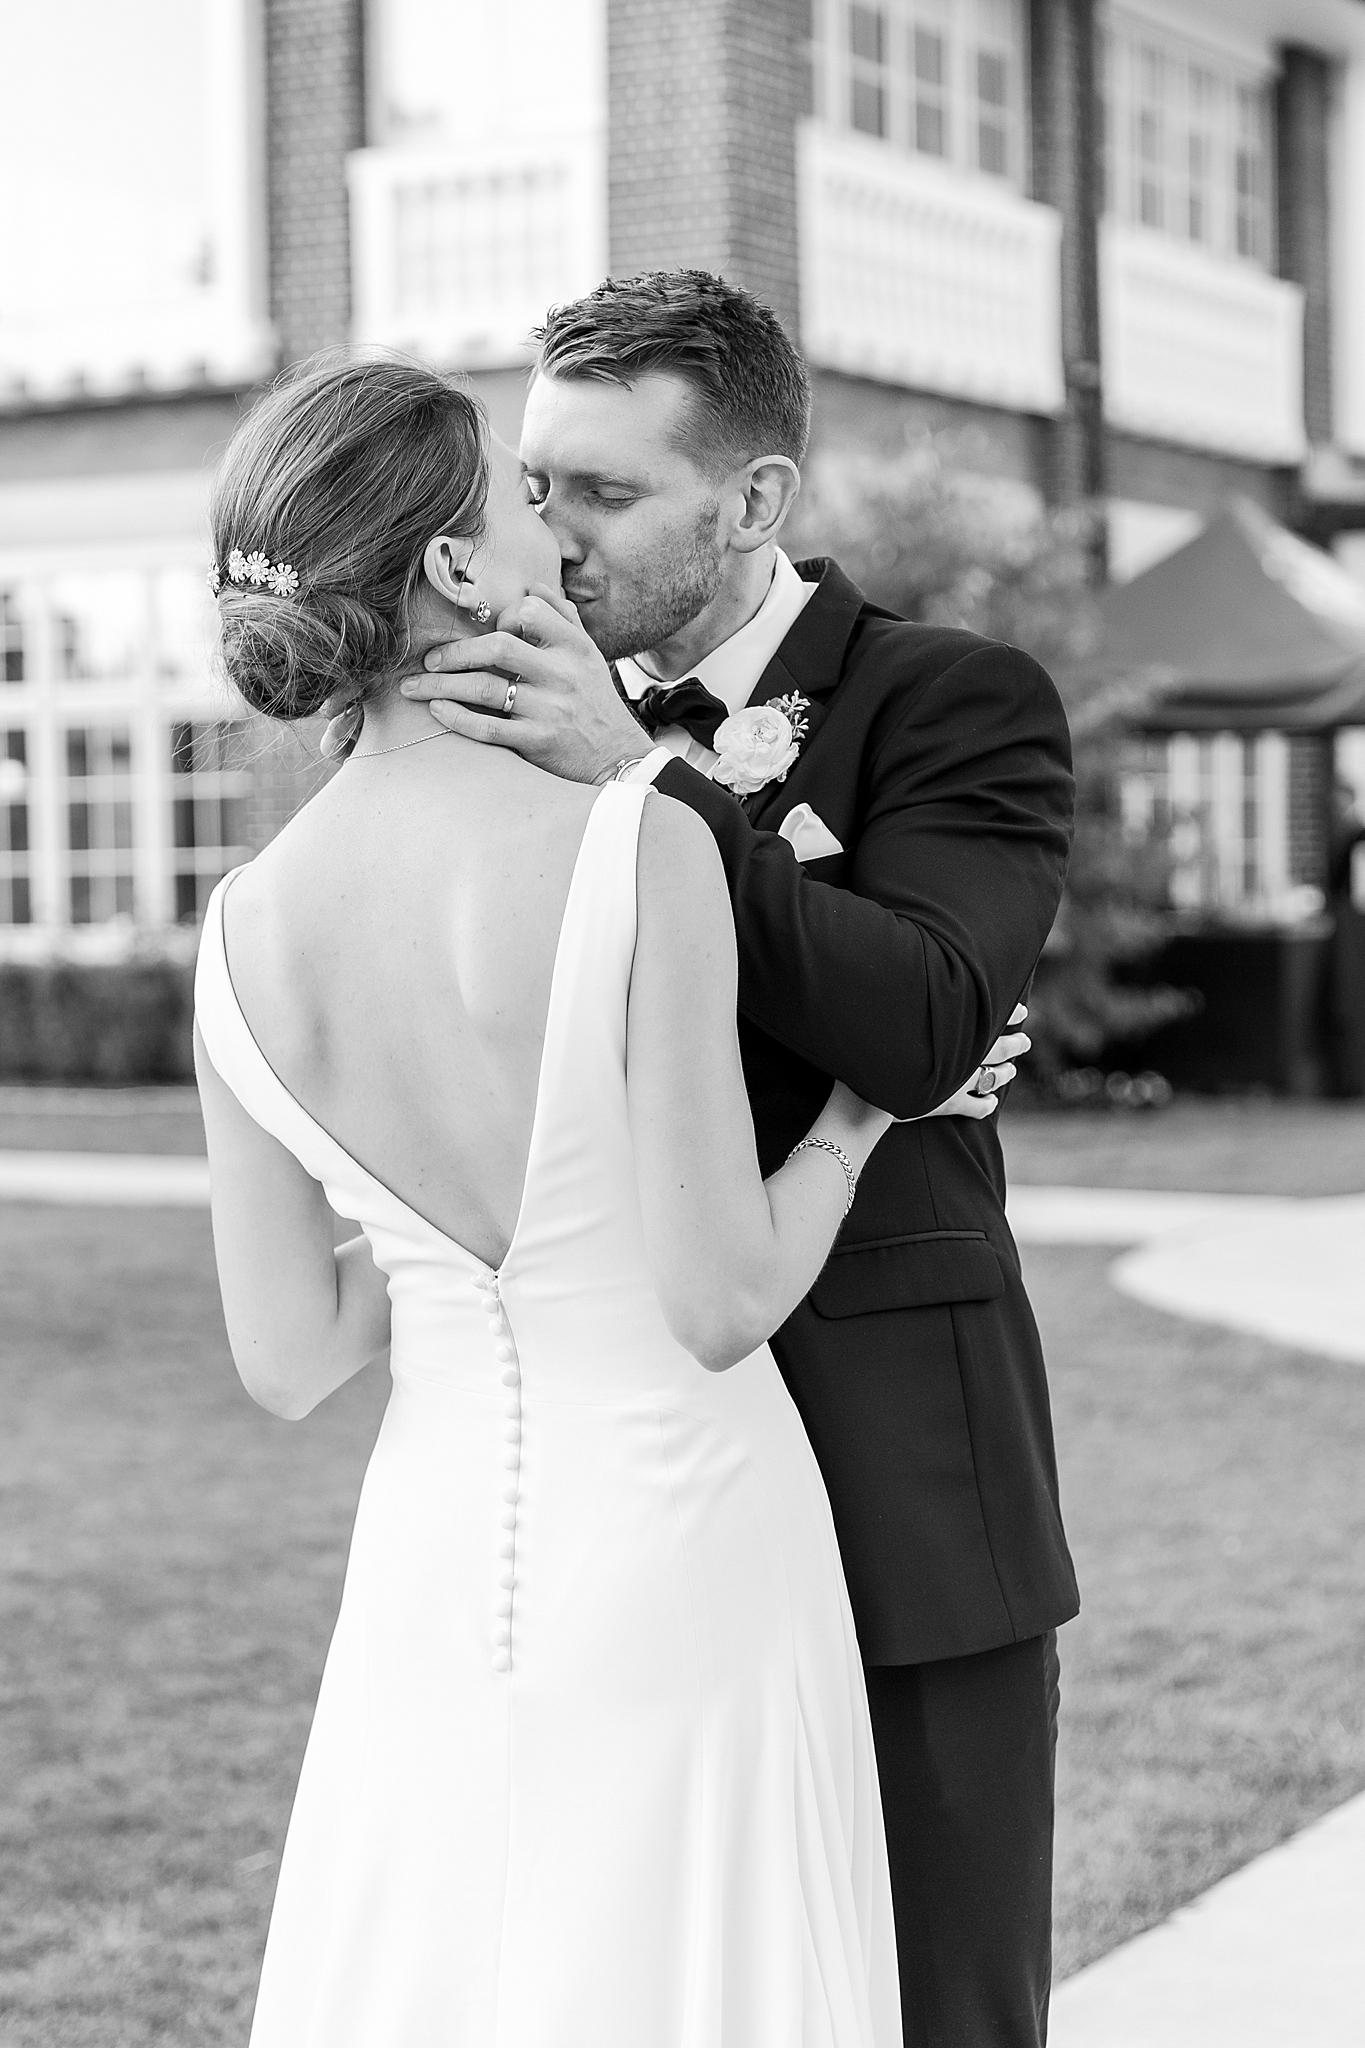 detroit-wedding-photographer-grosse-pointe-academy-chapel-detroit-golf-club-wedding-carly-matt-by-courtney-carolyn-photography_0120.jpg